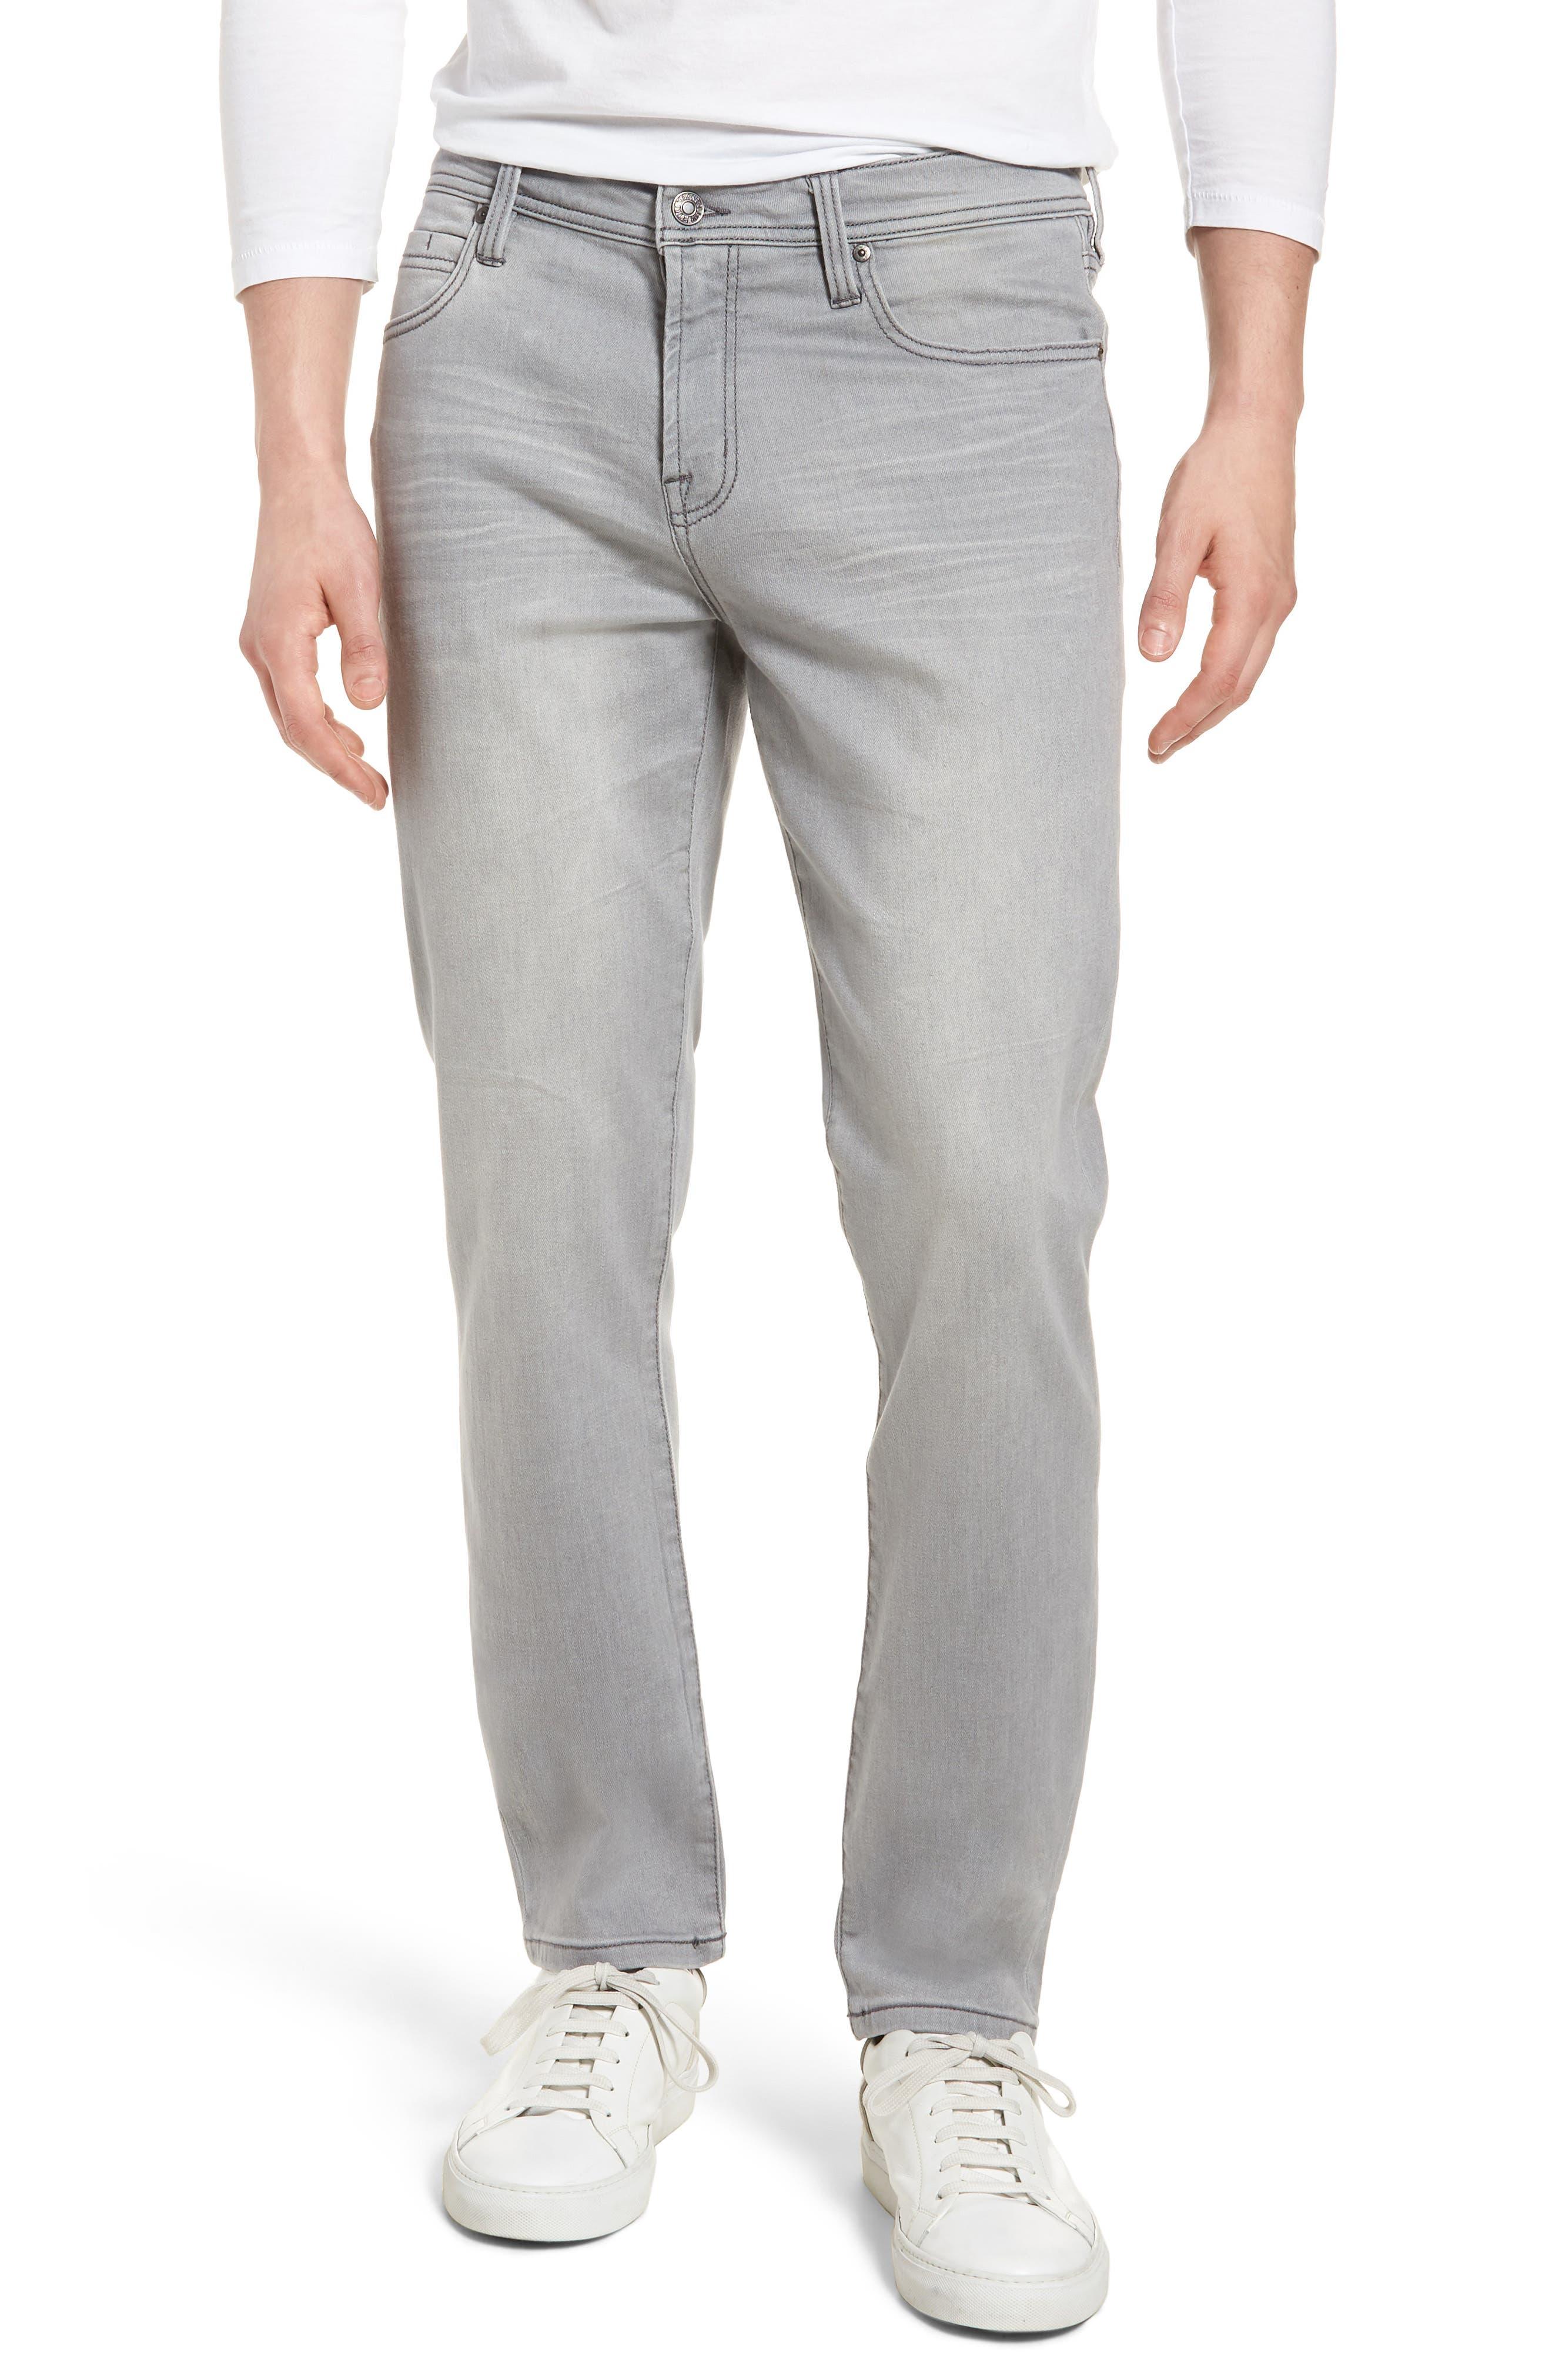 Jeans Co. Kingston Slim Straight Leg Jeans,                             Main thumbnail 1, color,                             COAL MINE DARK